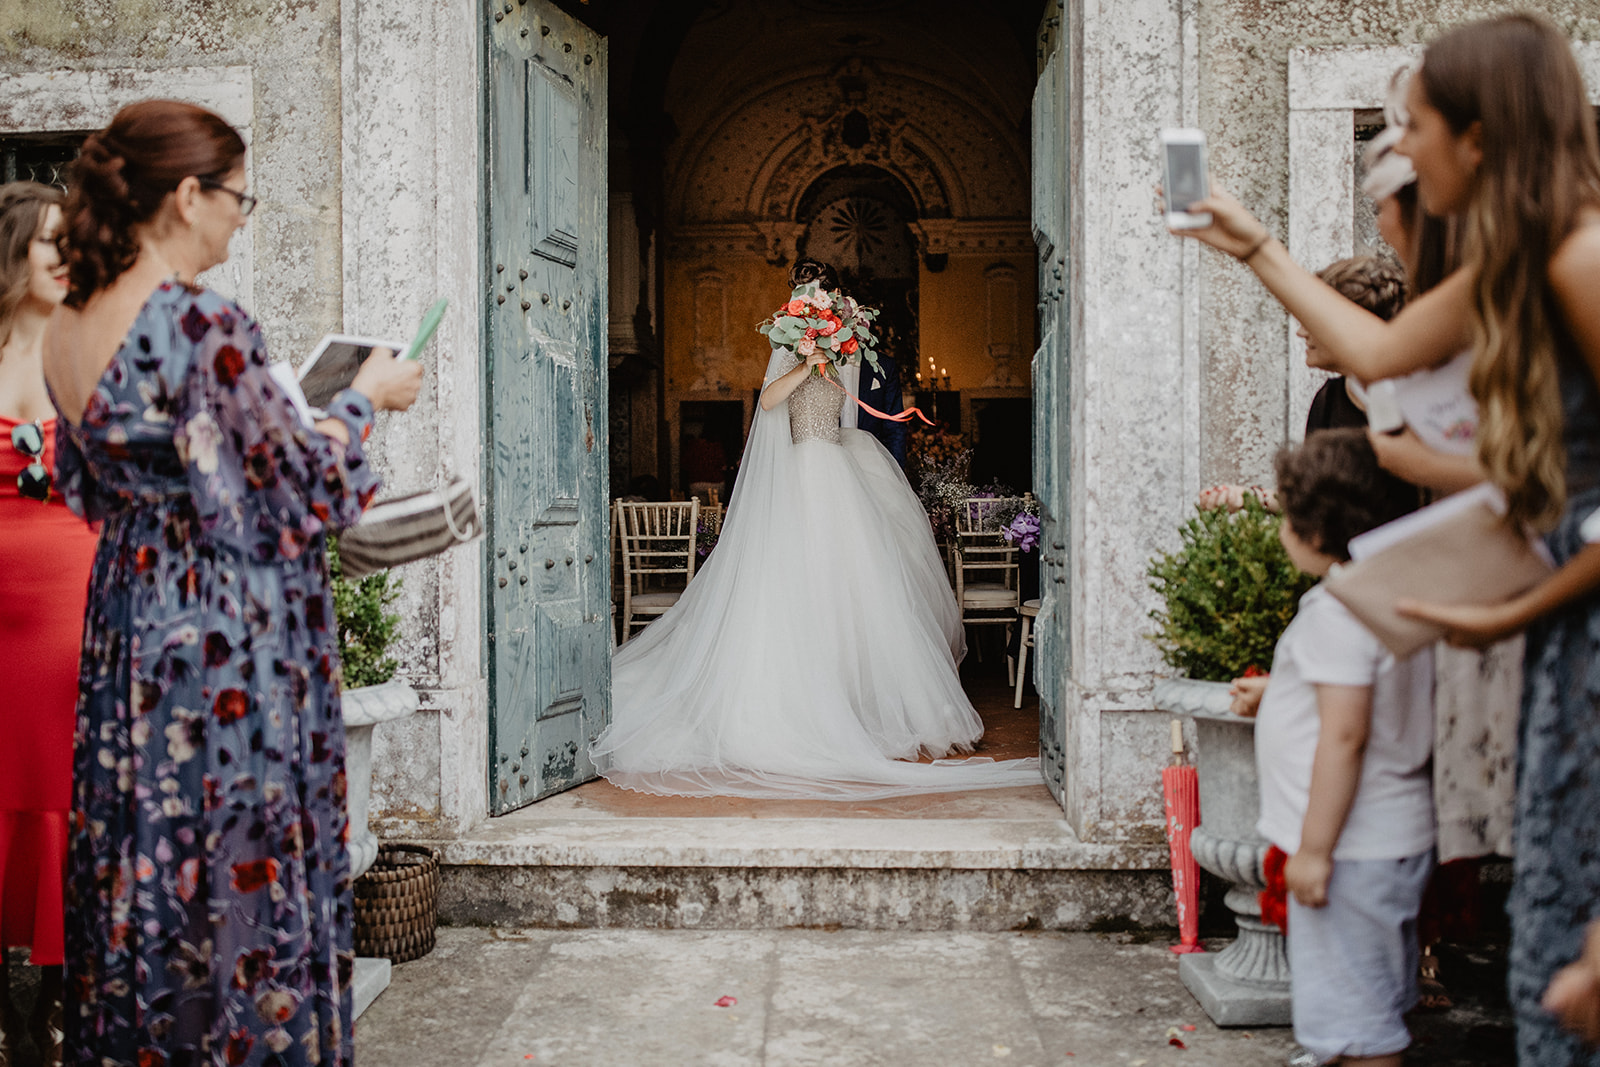 Lapela-photography-wedding-algarve-portugal-best-of-24.jpg